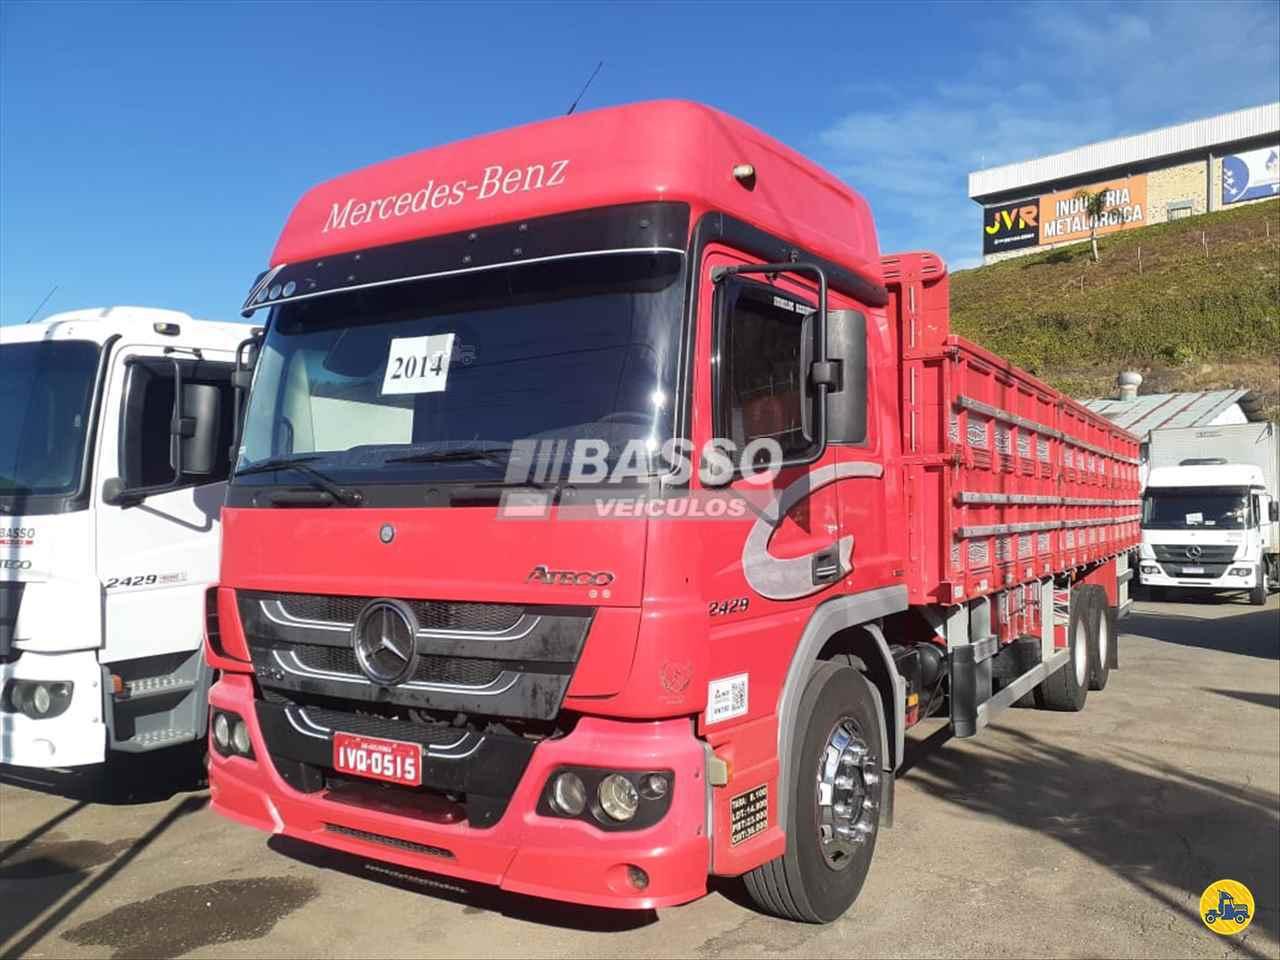 CAMINHAO MERCEDES-BENZ MB 2429 Carga Seca Truck 6x2 Basso Veículos GARIBALDI RIO GRANDE DO SUL RS